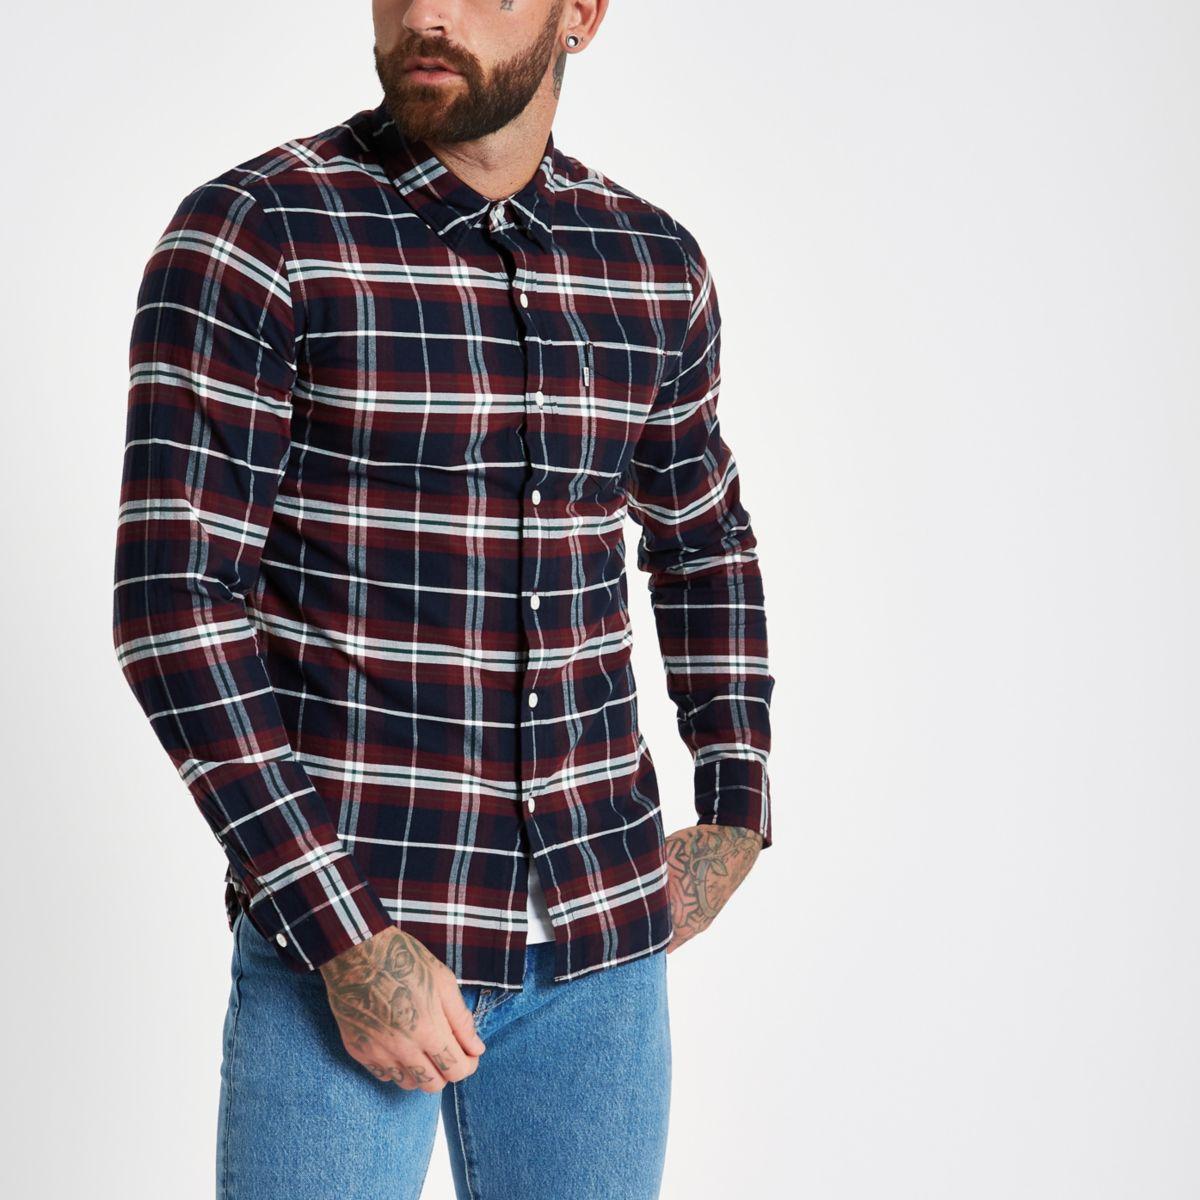 Levi's purple check shirt